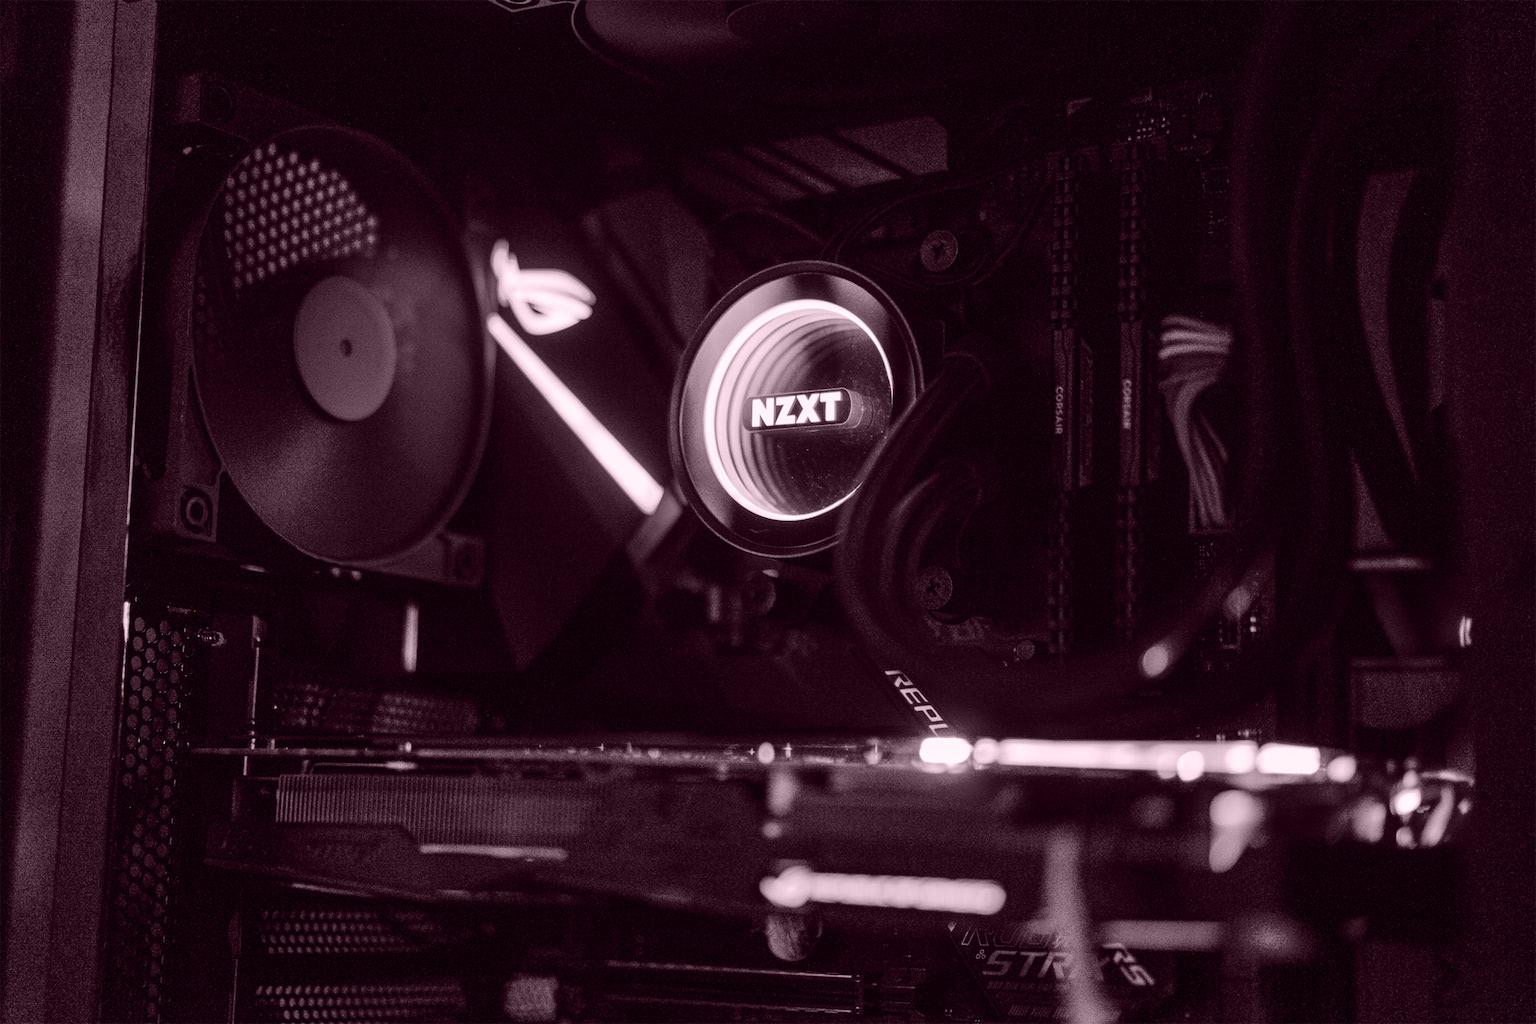 Gaming machine with the side door off exposing the illuminated NZXT CPU water cooler and GPU, 2018. Alexandria, VA.